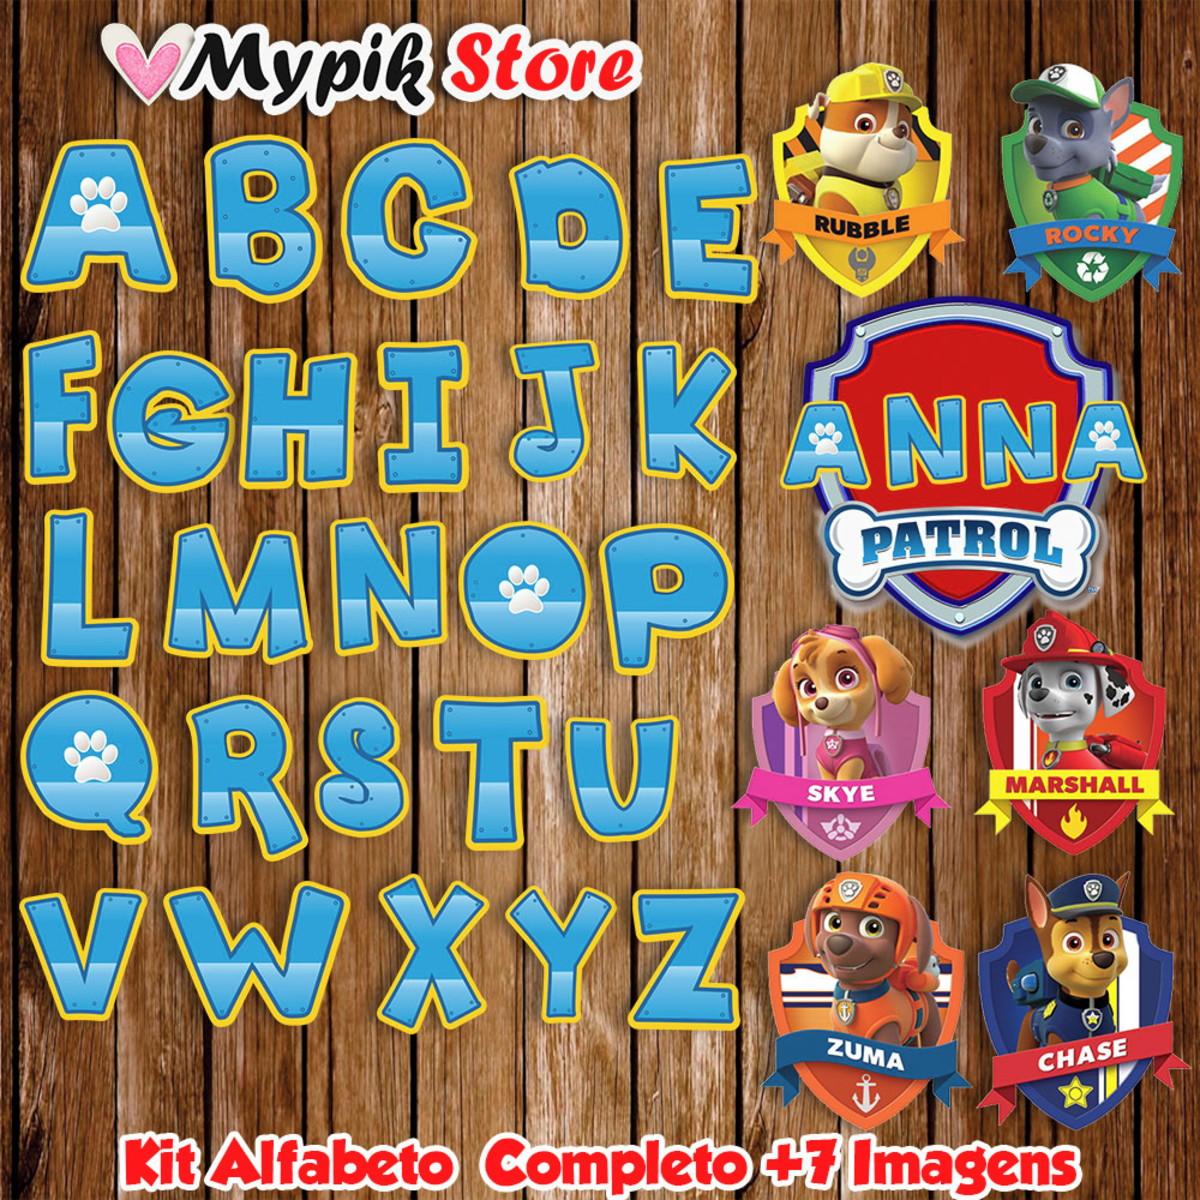 Kit Digital Patrulha Canina Alfabeto E Letras No Elo7 Mypik